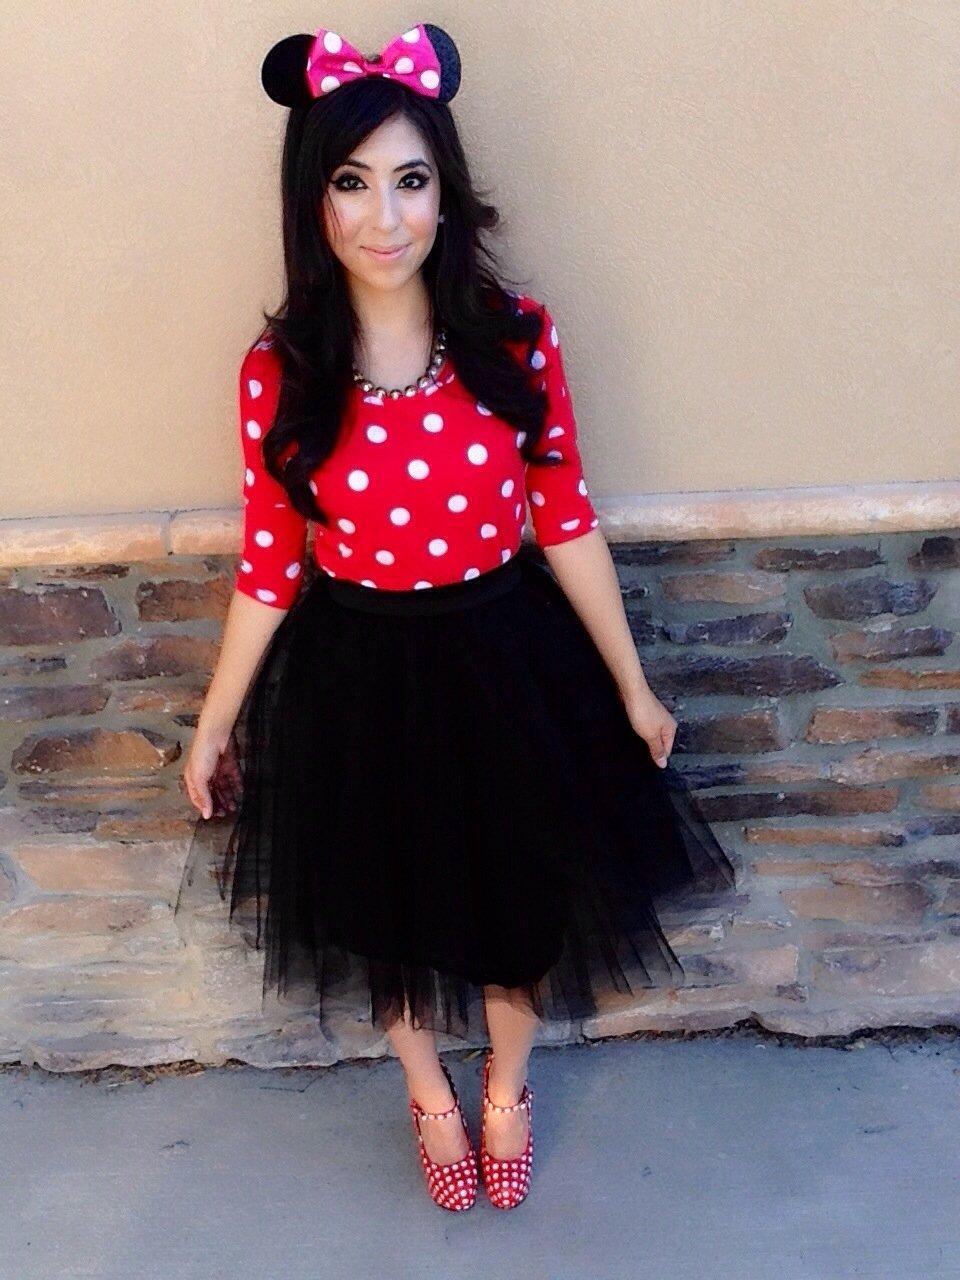 10 Great Minnie Mouse Costume Ideas For Women minniemouse a modest fashion faith blog 2020